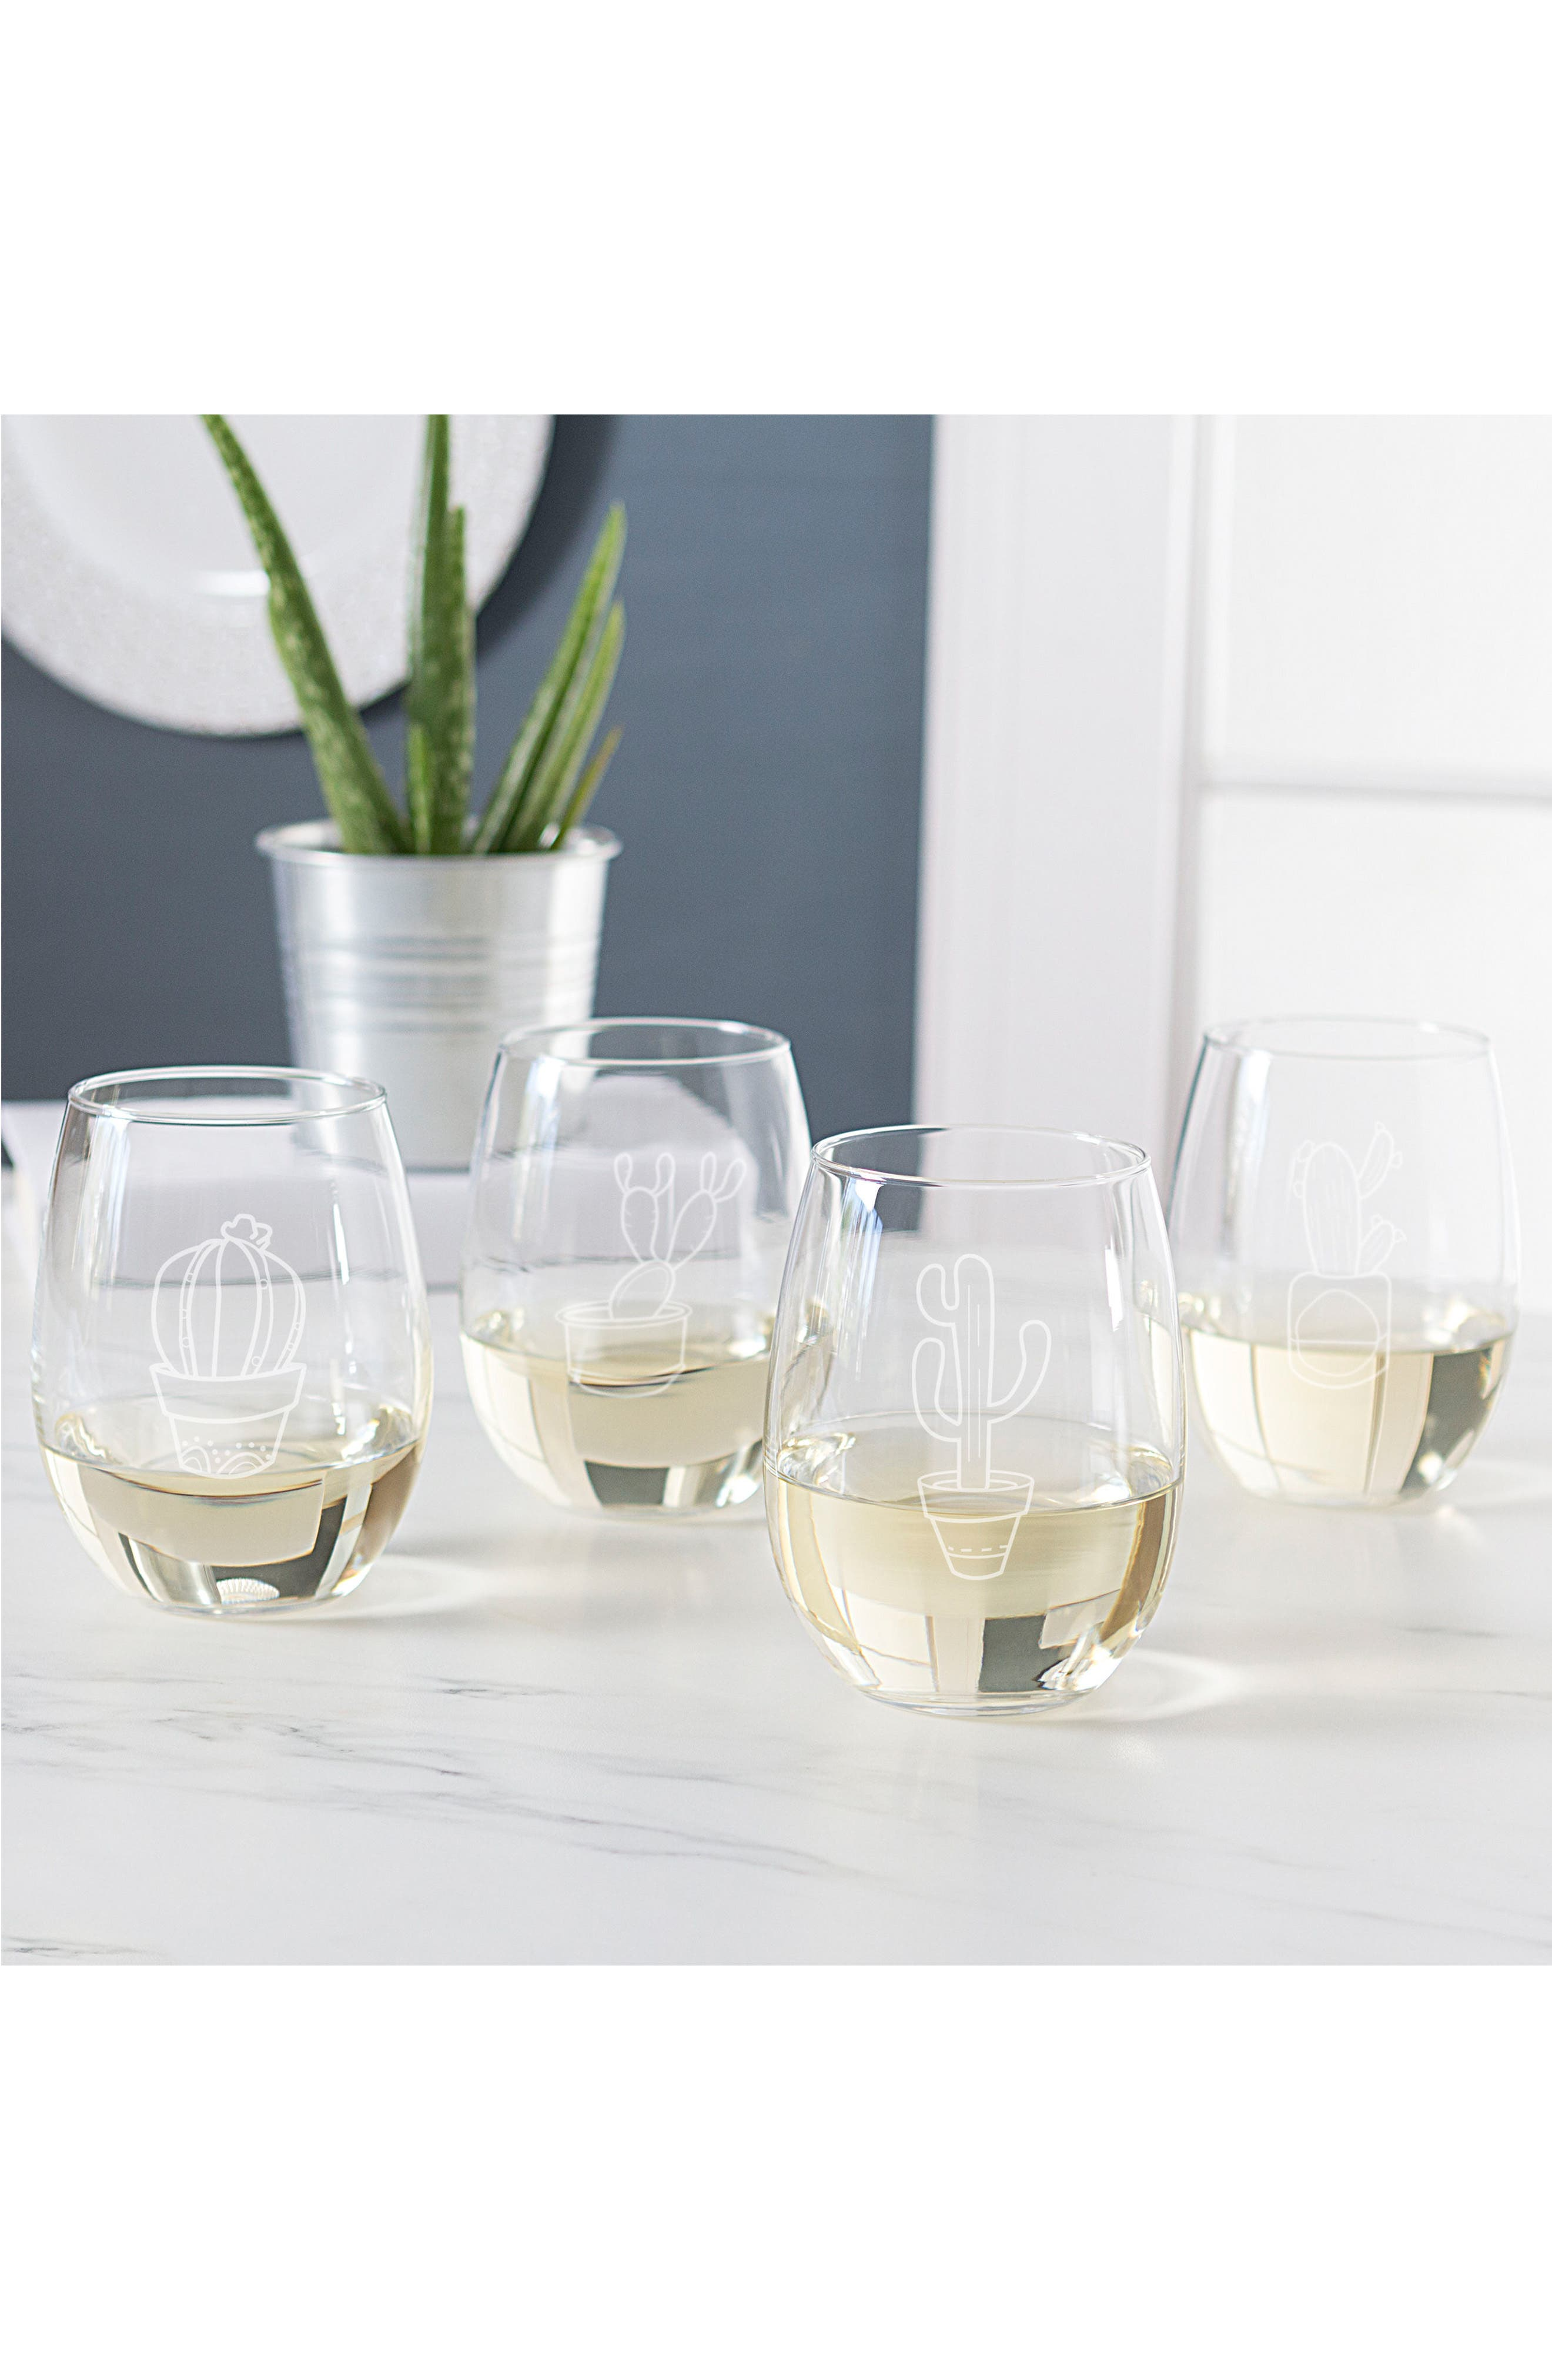 Cactus Set of 4 Stemless Wine Glasses,                             Alternate thumbnail 4, color,                             100